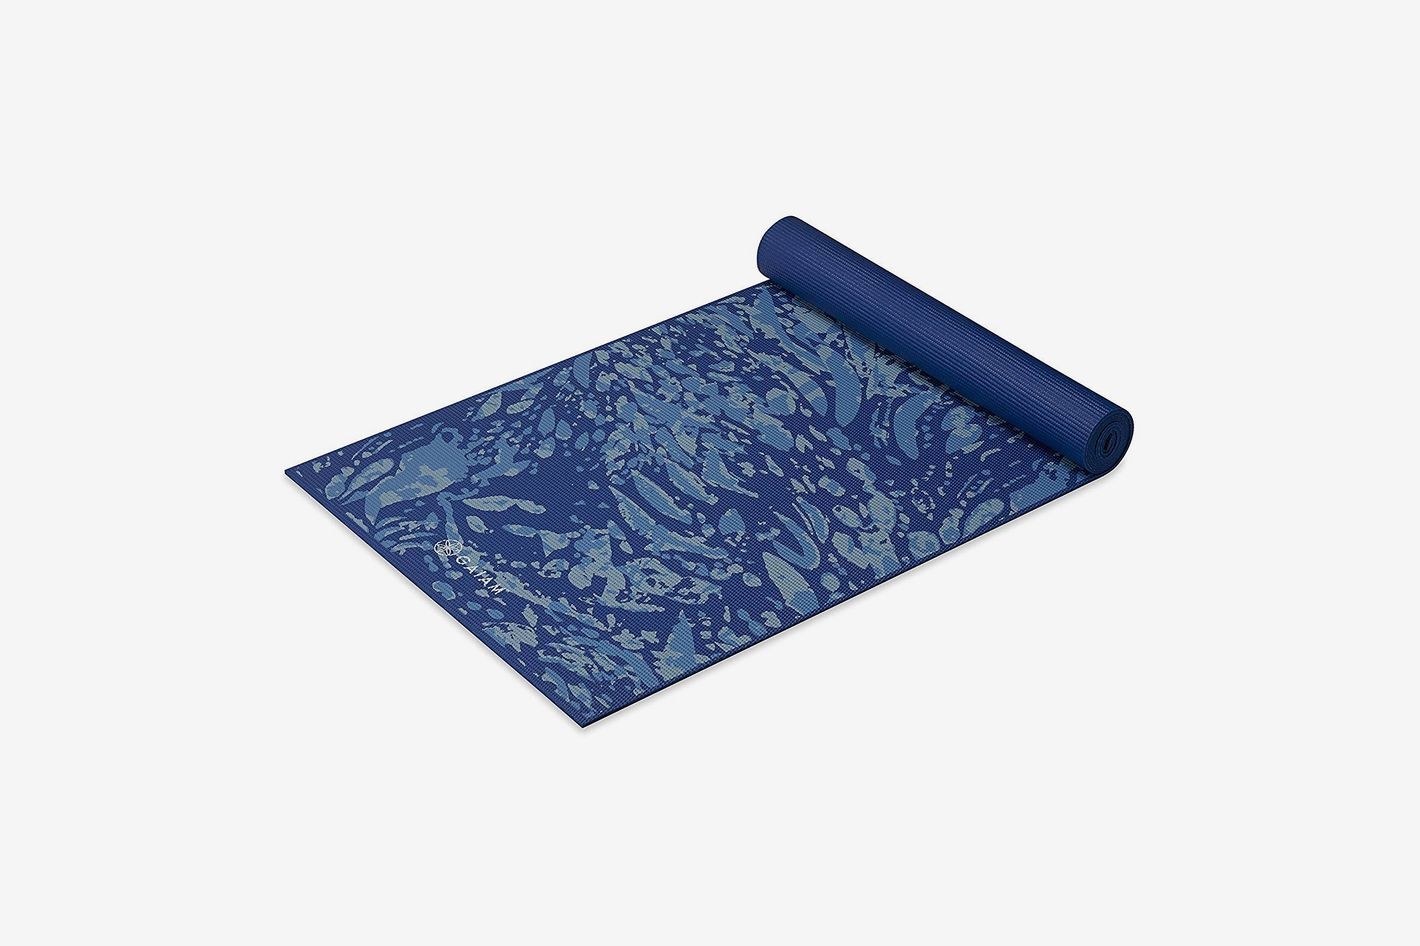 Gaiam 6mm Extra Thick Yoga Mat, Coastal Blue Pattern